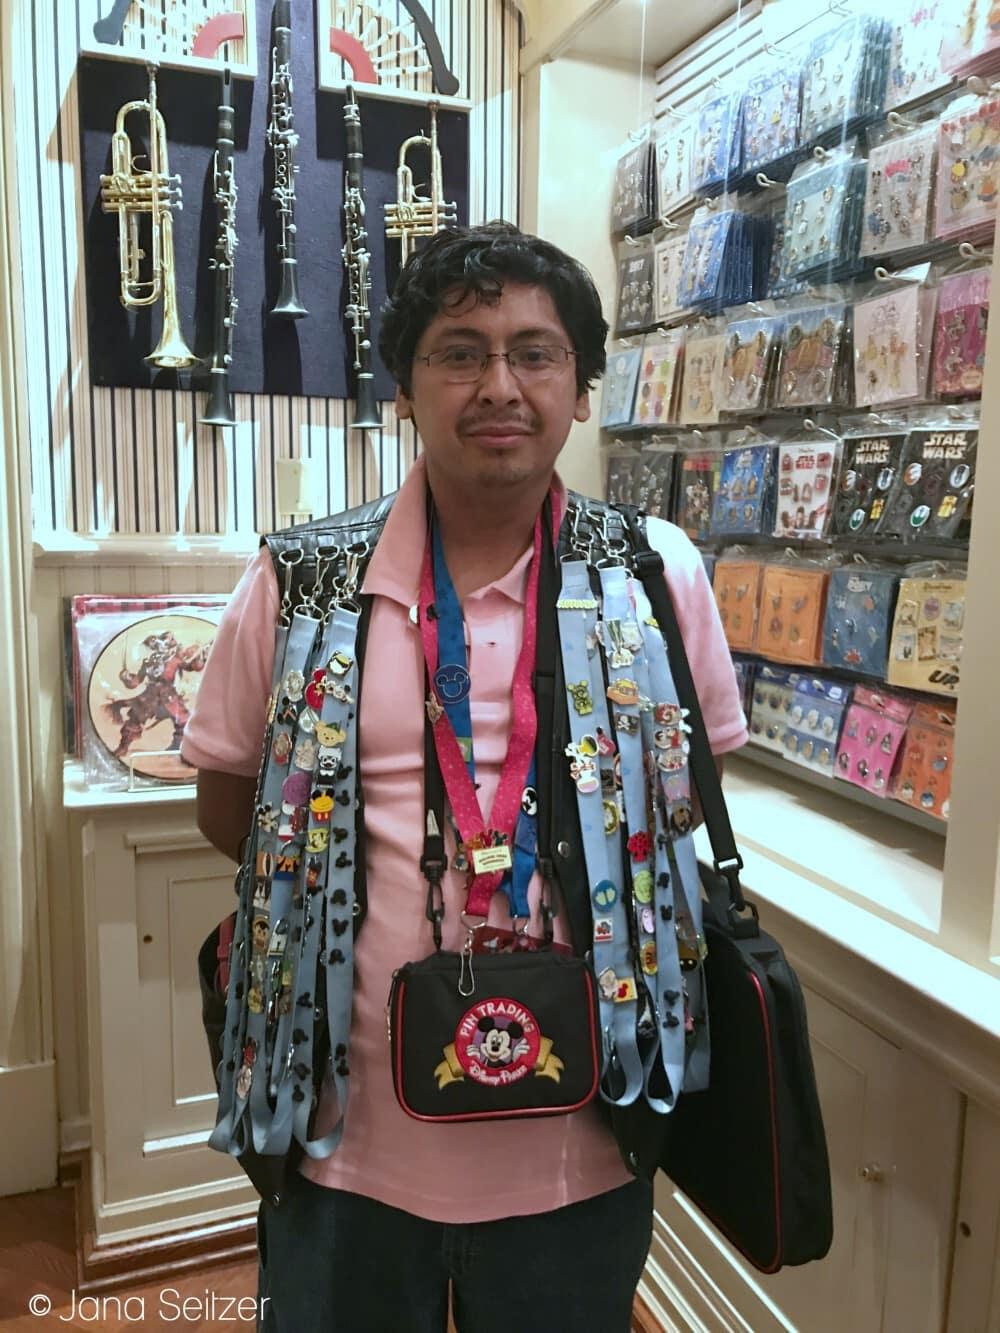 pro pin trader Beginner's Guide To Pin Trading at Disney World: Disney Pin Trading 101